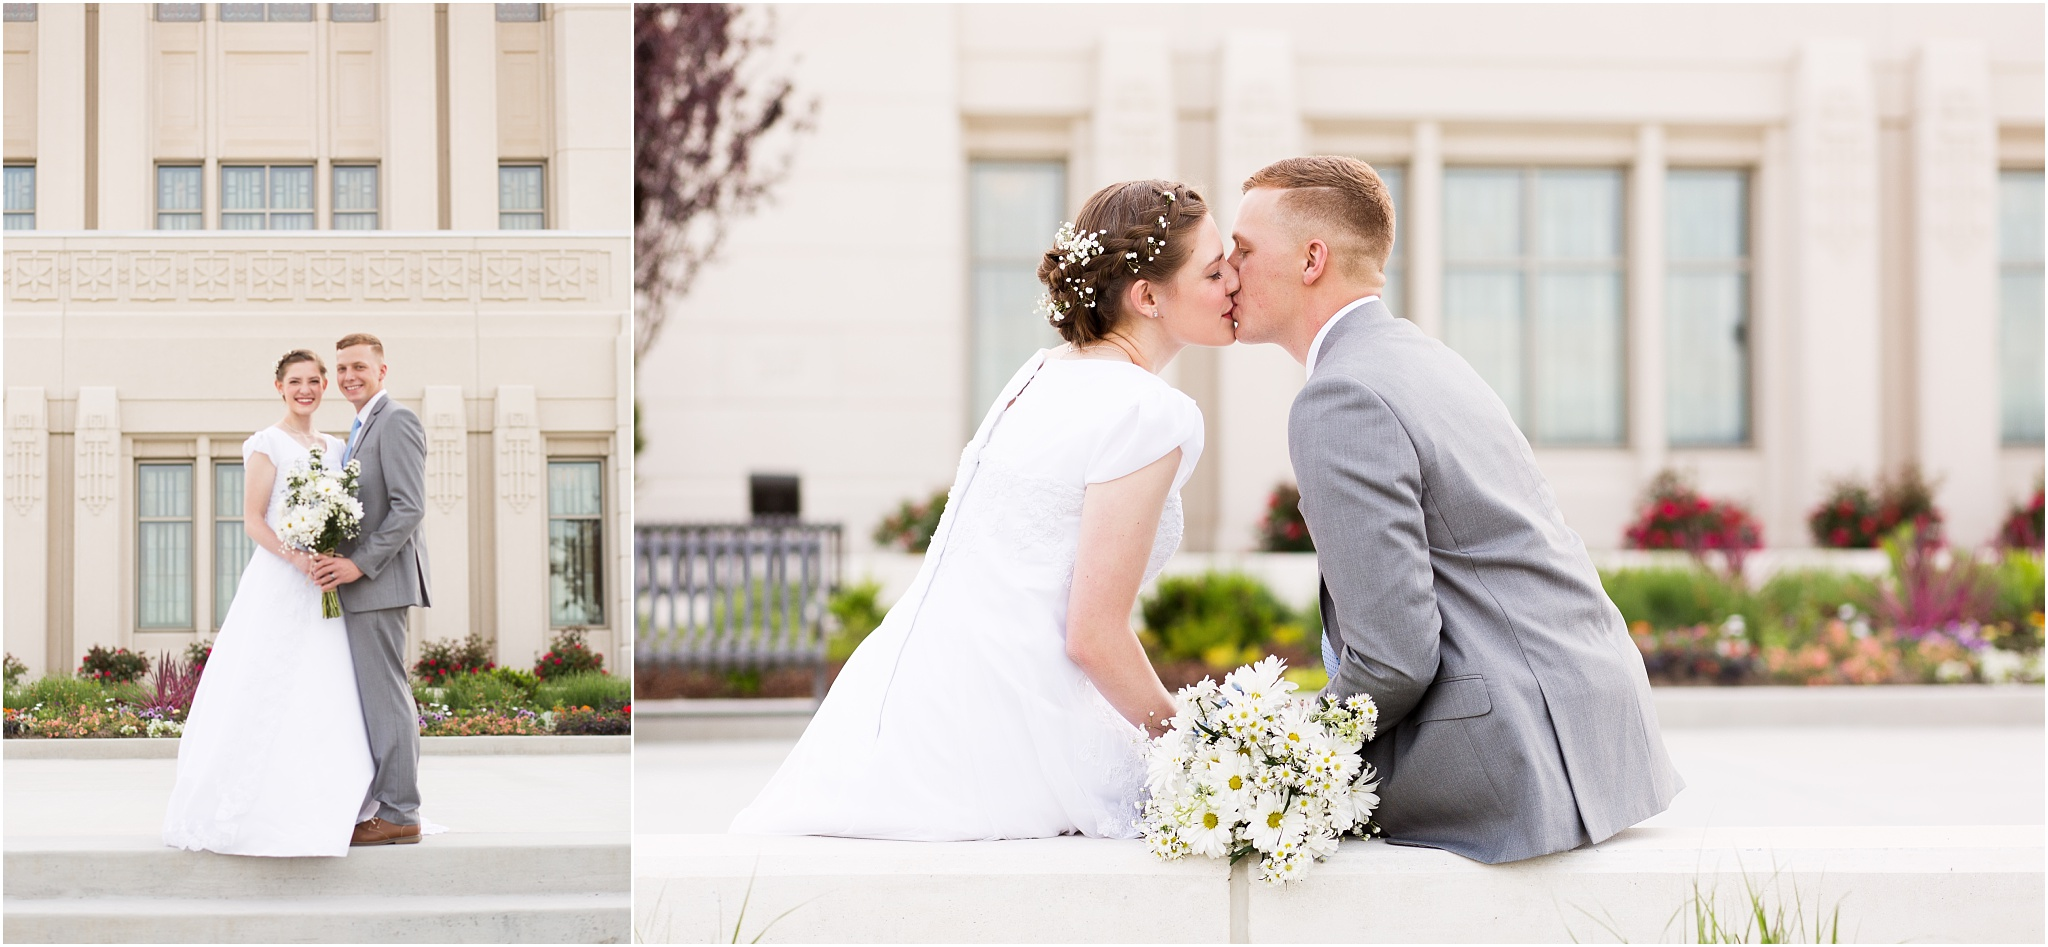 Wedding Photography_Meridian Idaho Temple_Boise Idaho_Leah Southwick Photography_0038.jpg